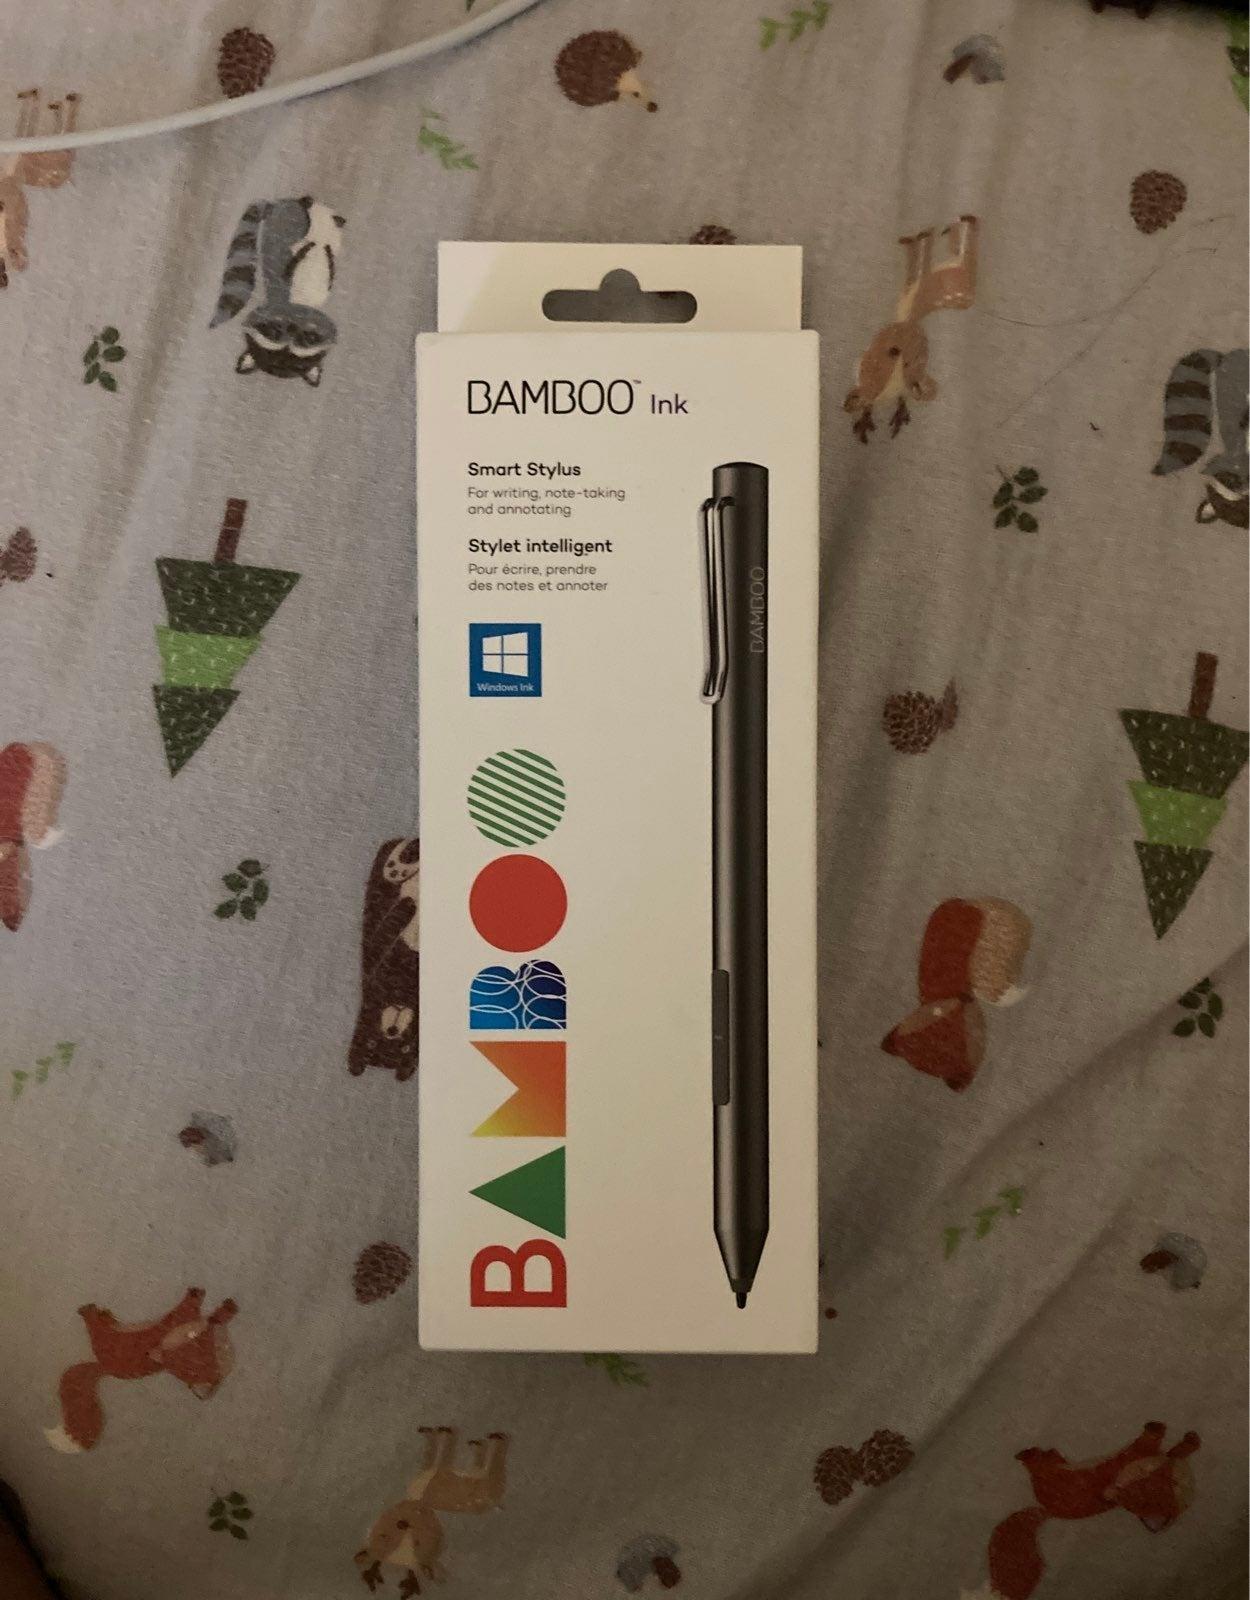 Bamboo Ink Smart Stylus